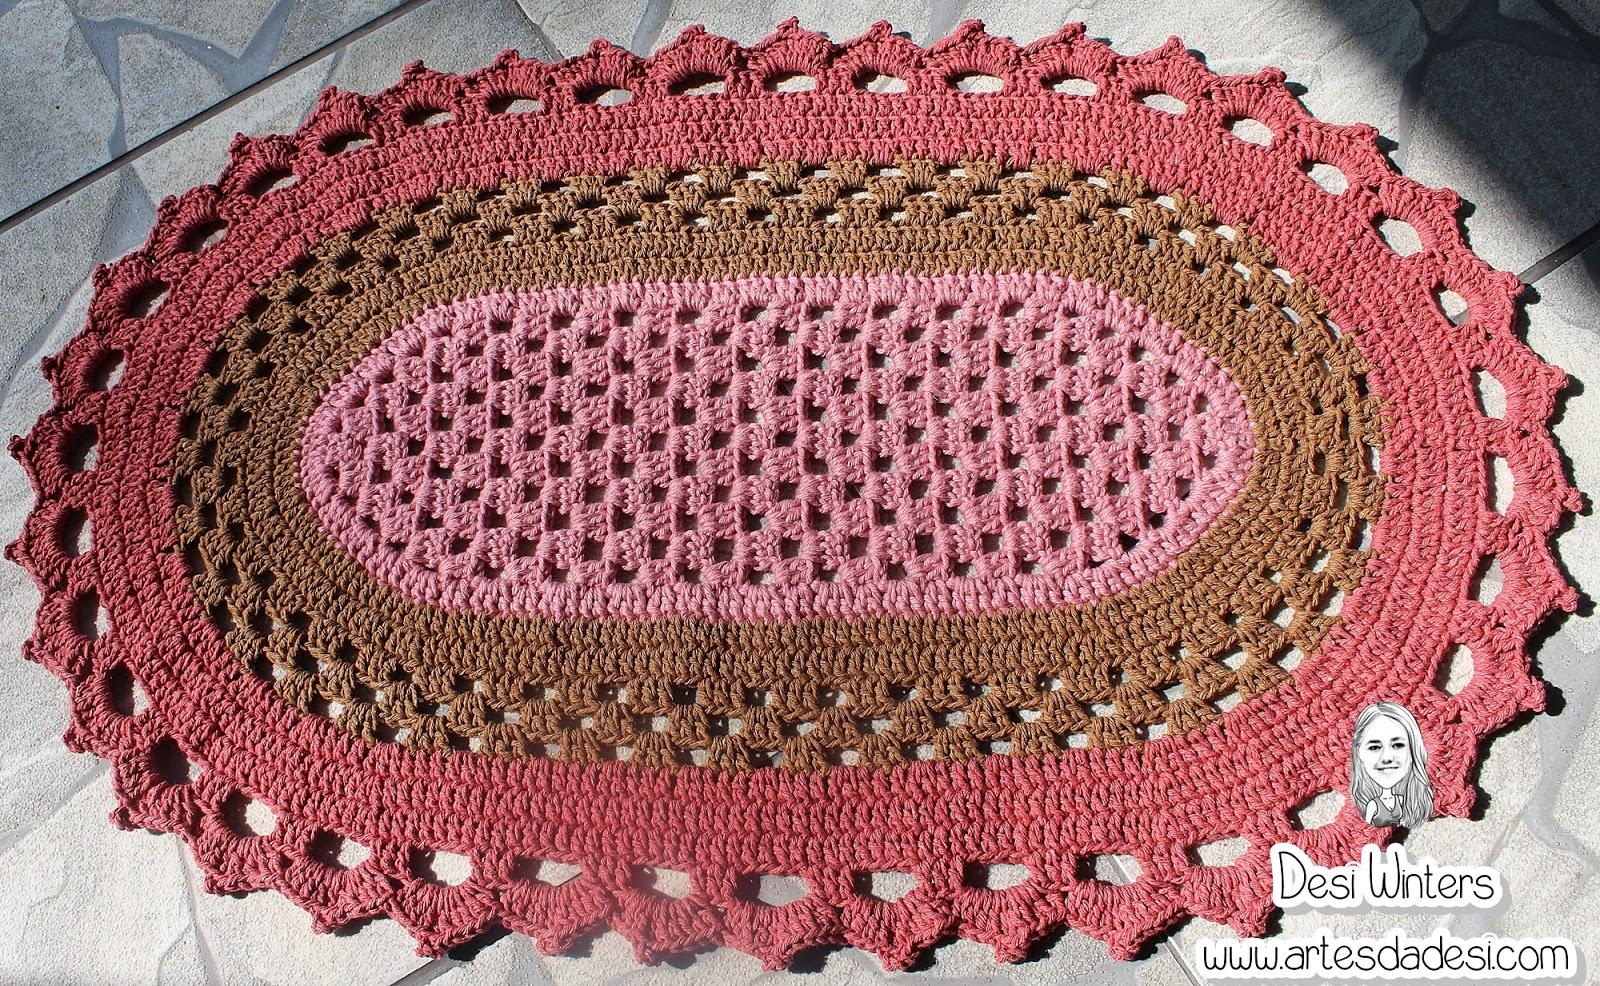 Tapete Oval Simples De Croch  -> Tapete De Croche Oval Simples Passo A Passo